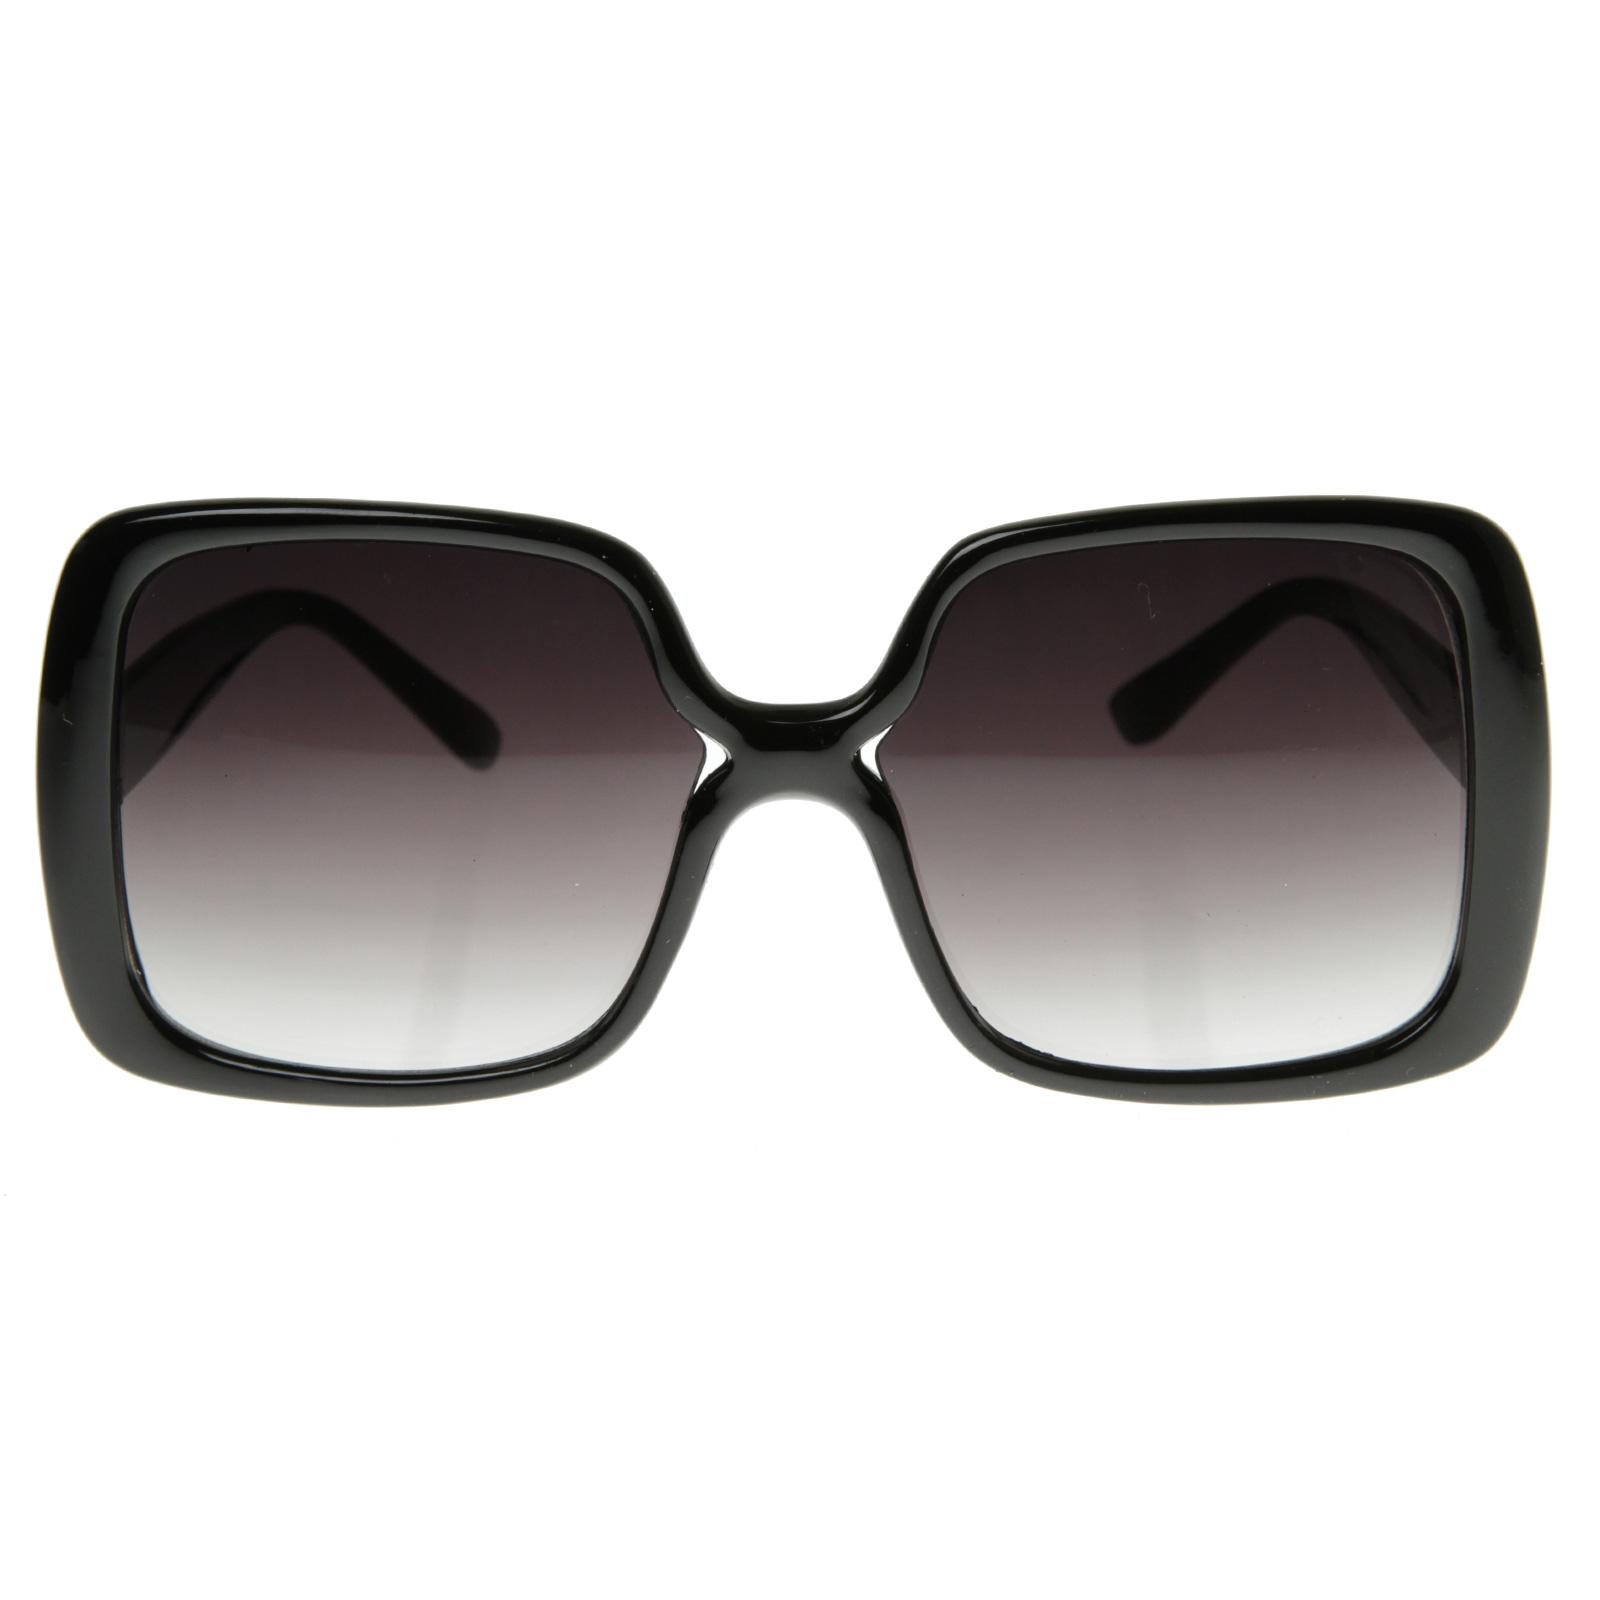 Eyeglass Frames Union Square Nyc : Chic New York Trendy Fashion Womens Oversized Large Bold ...